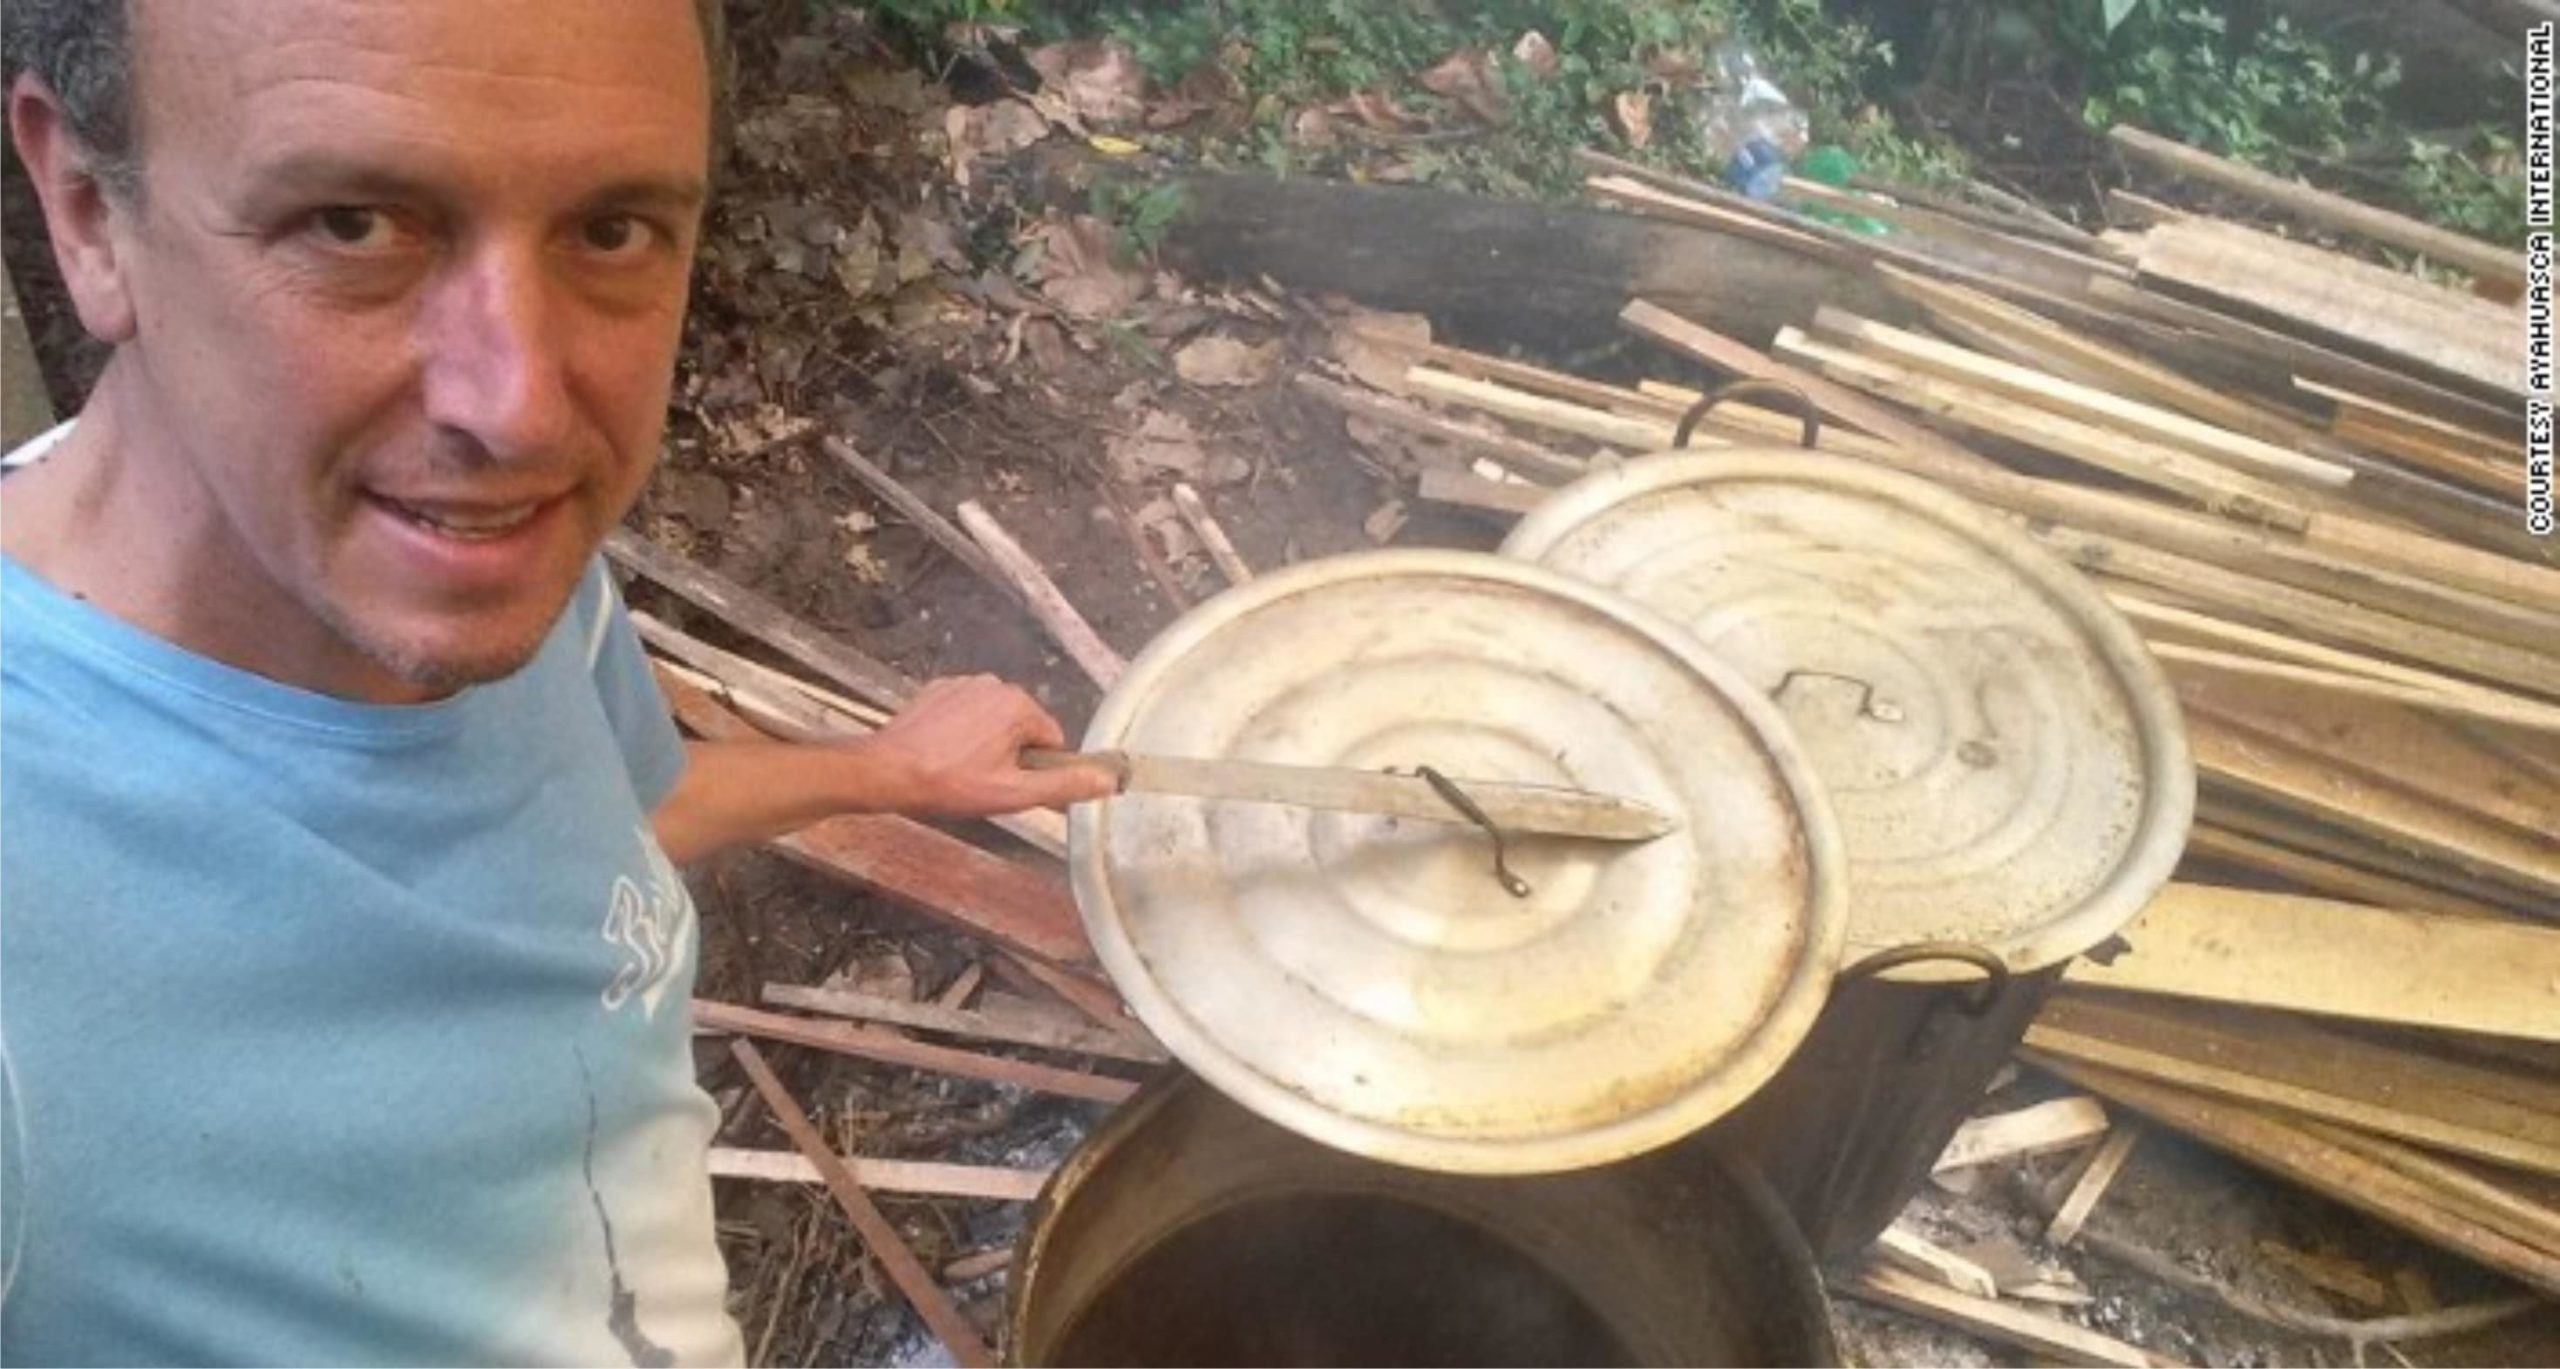 alberto cocinando ayahuasca